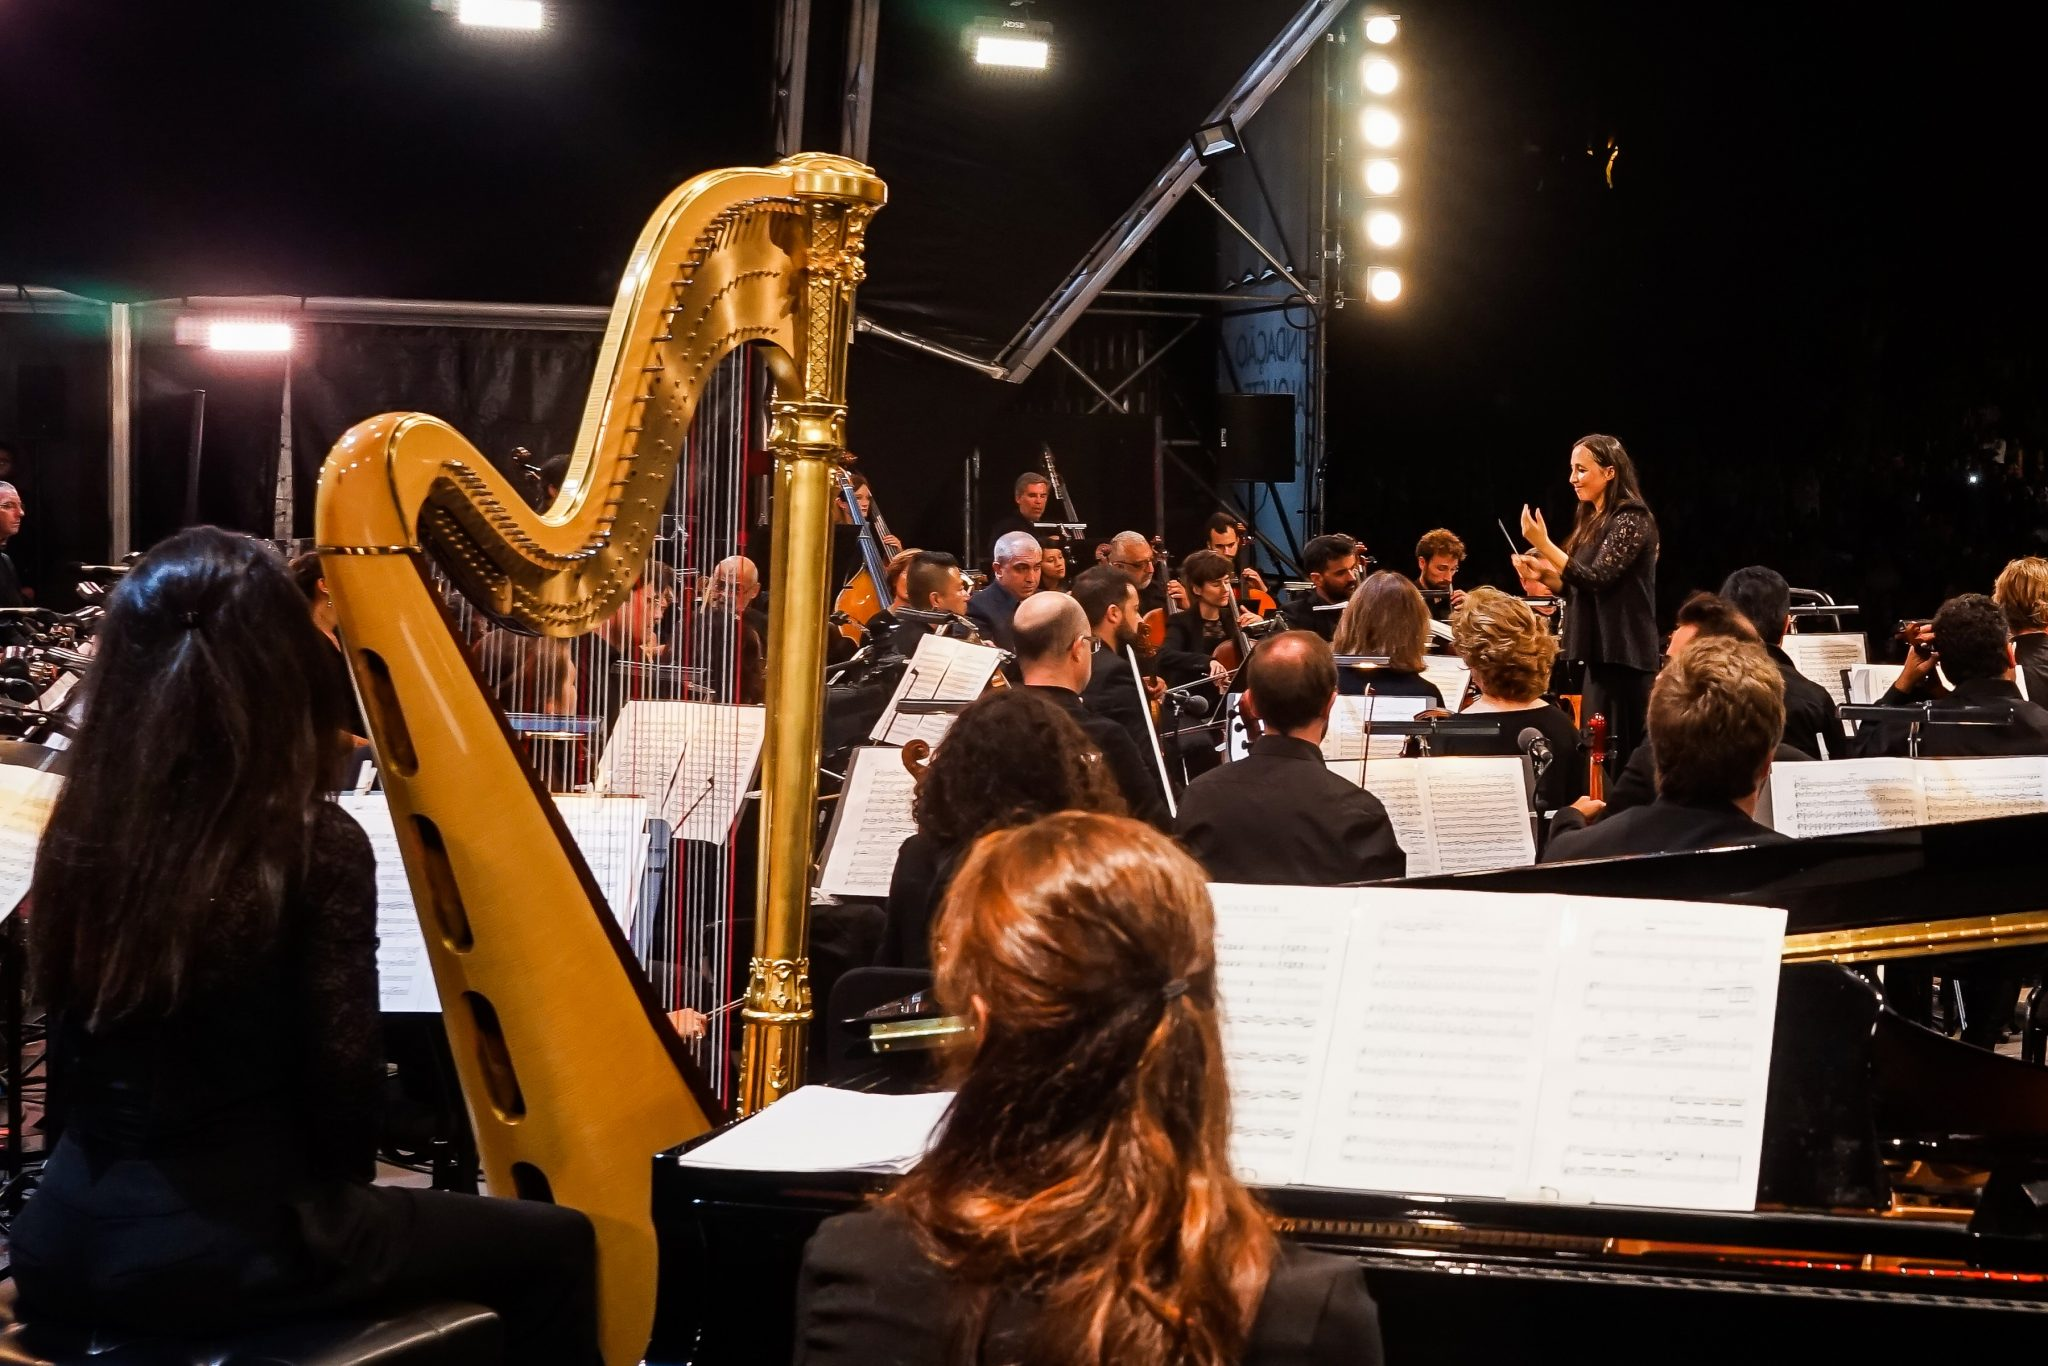 Músicos da Orquestra Gulbenkian